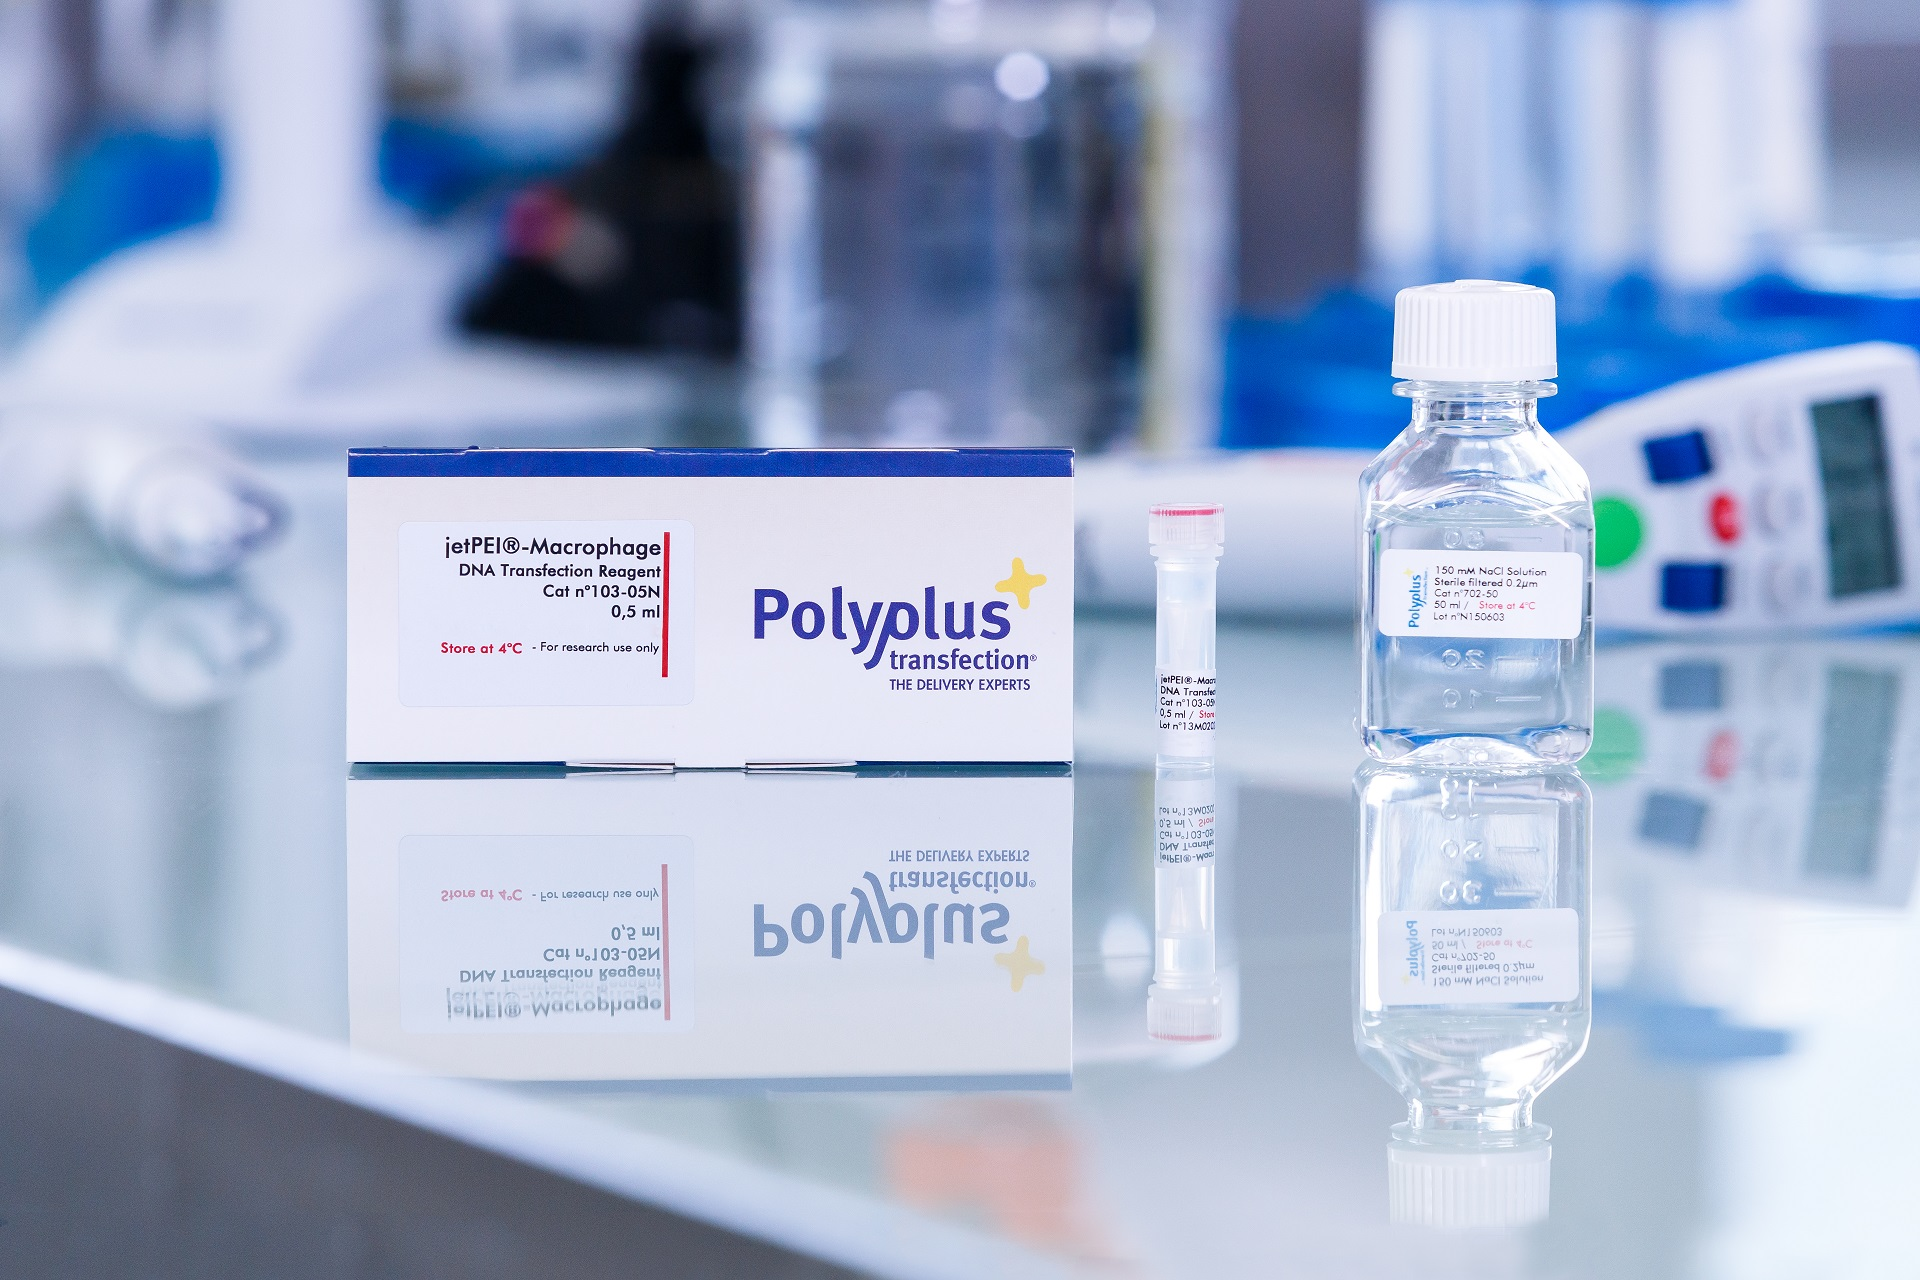 jetPEI-Macrophage packaging - Polyplus-transfection